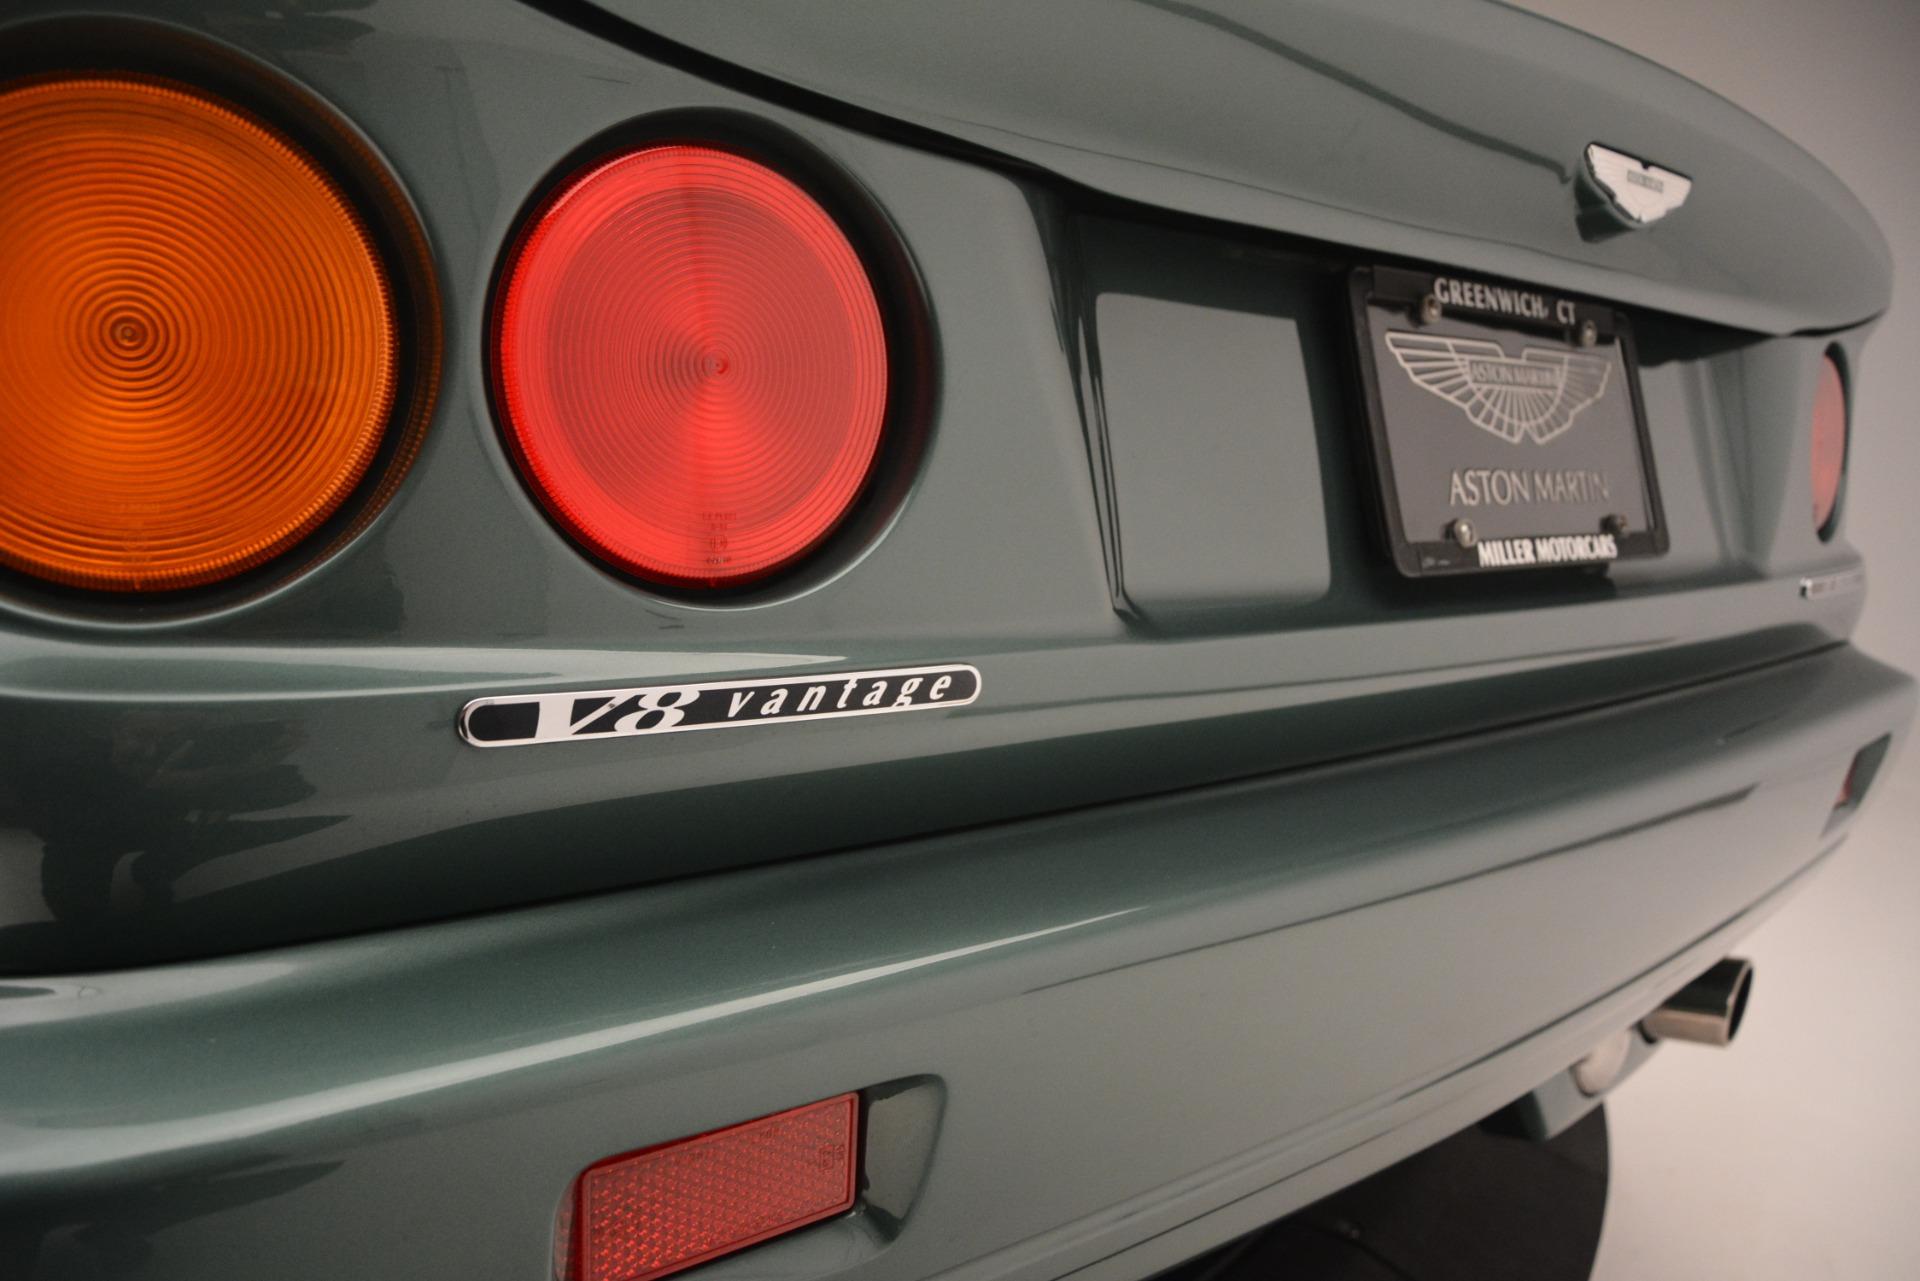 Used 1999 Aston Martin V8 Vantage Le Mans V600 Coupe For Sale In Westport, CT 2789_p40